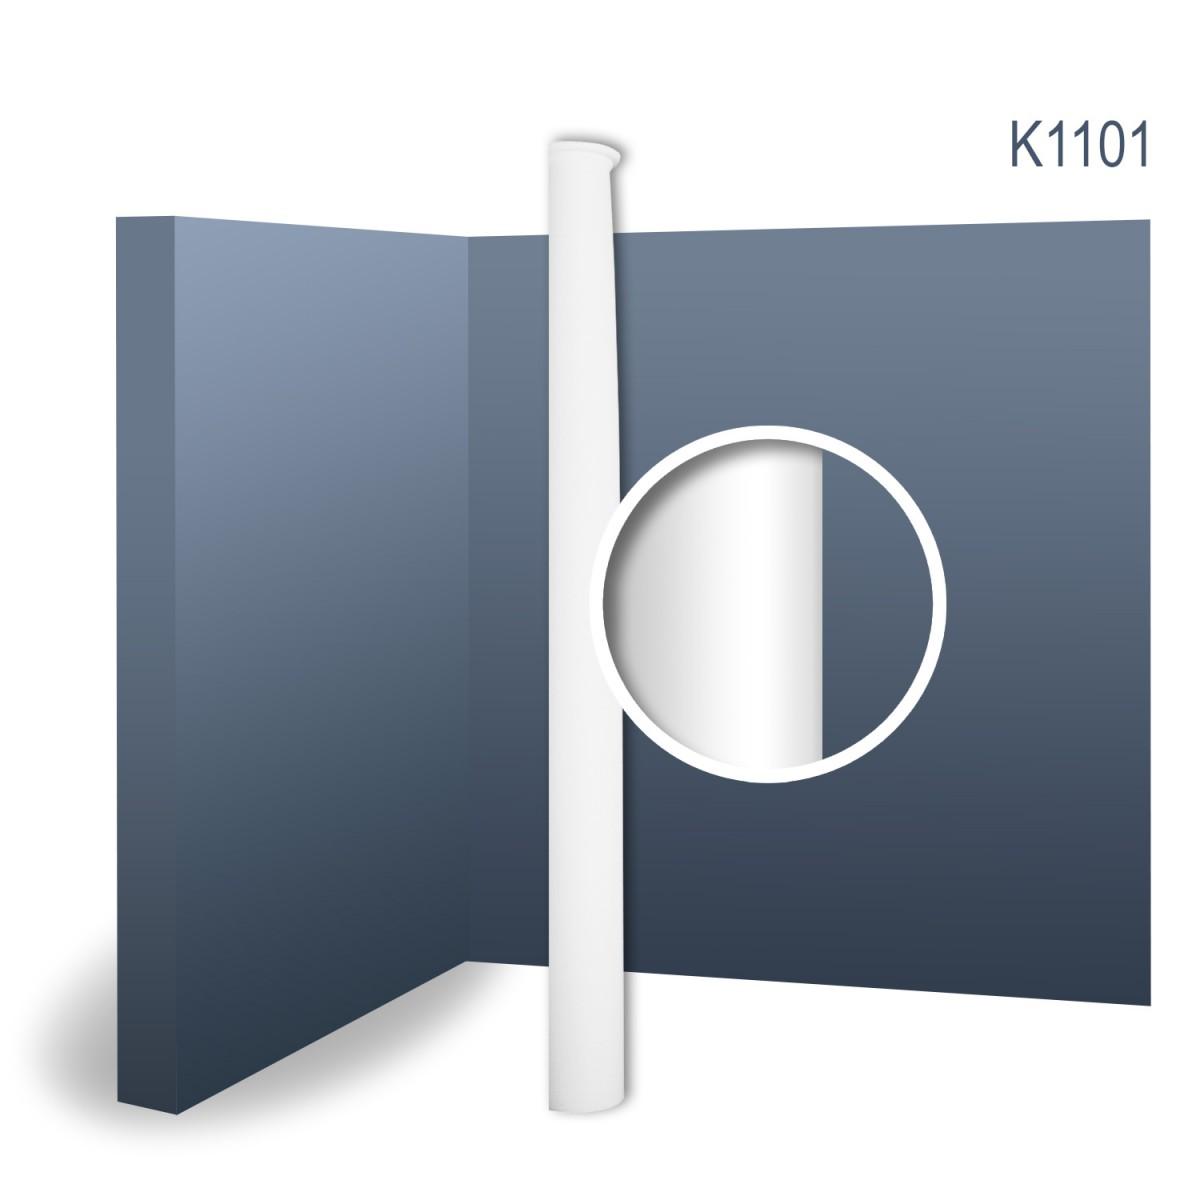 Jumatate De Coloana Luxxus K1101, Dimensiuni: 22 X 11 X 202 cm, Orac Decor